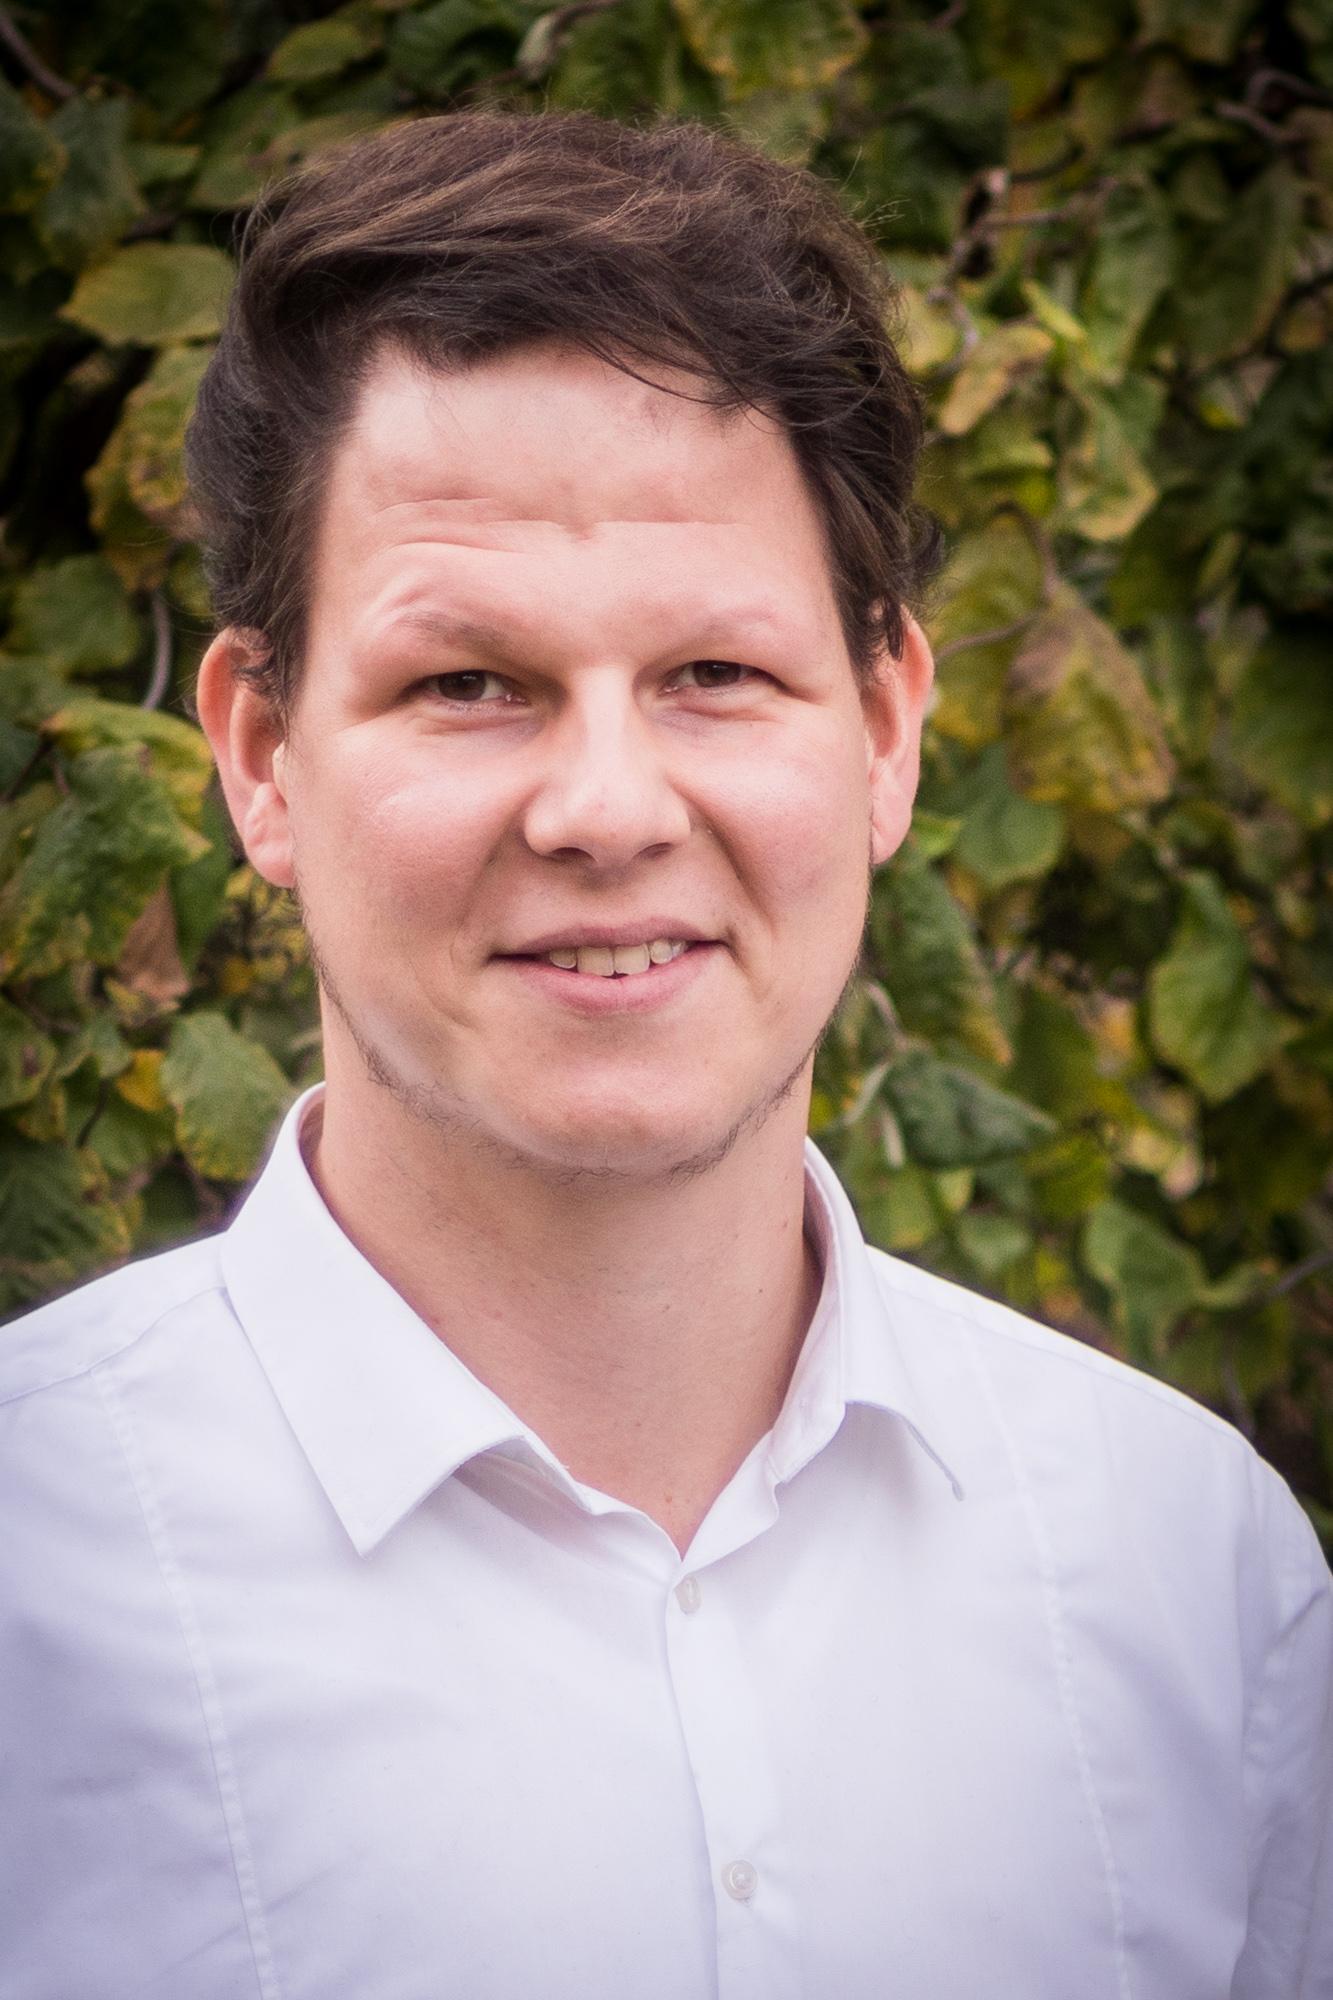 Daniel Pätzold